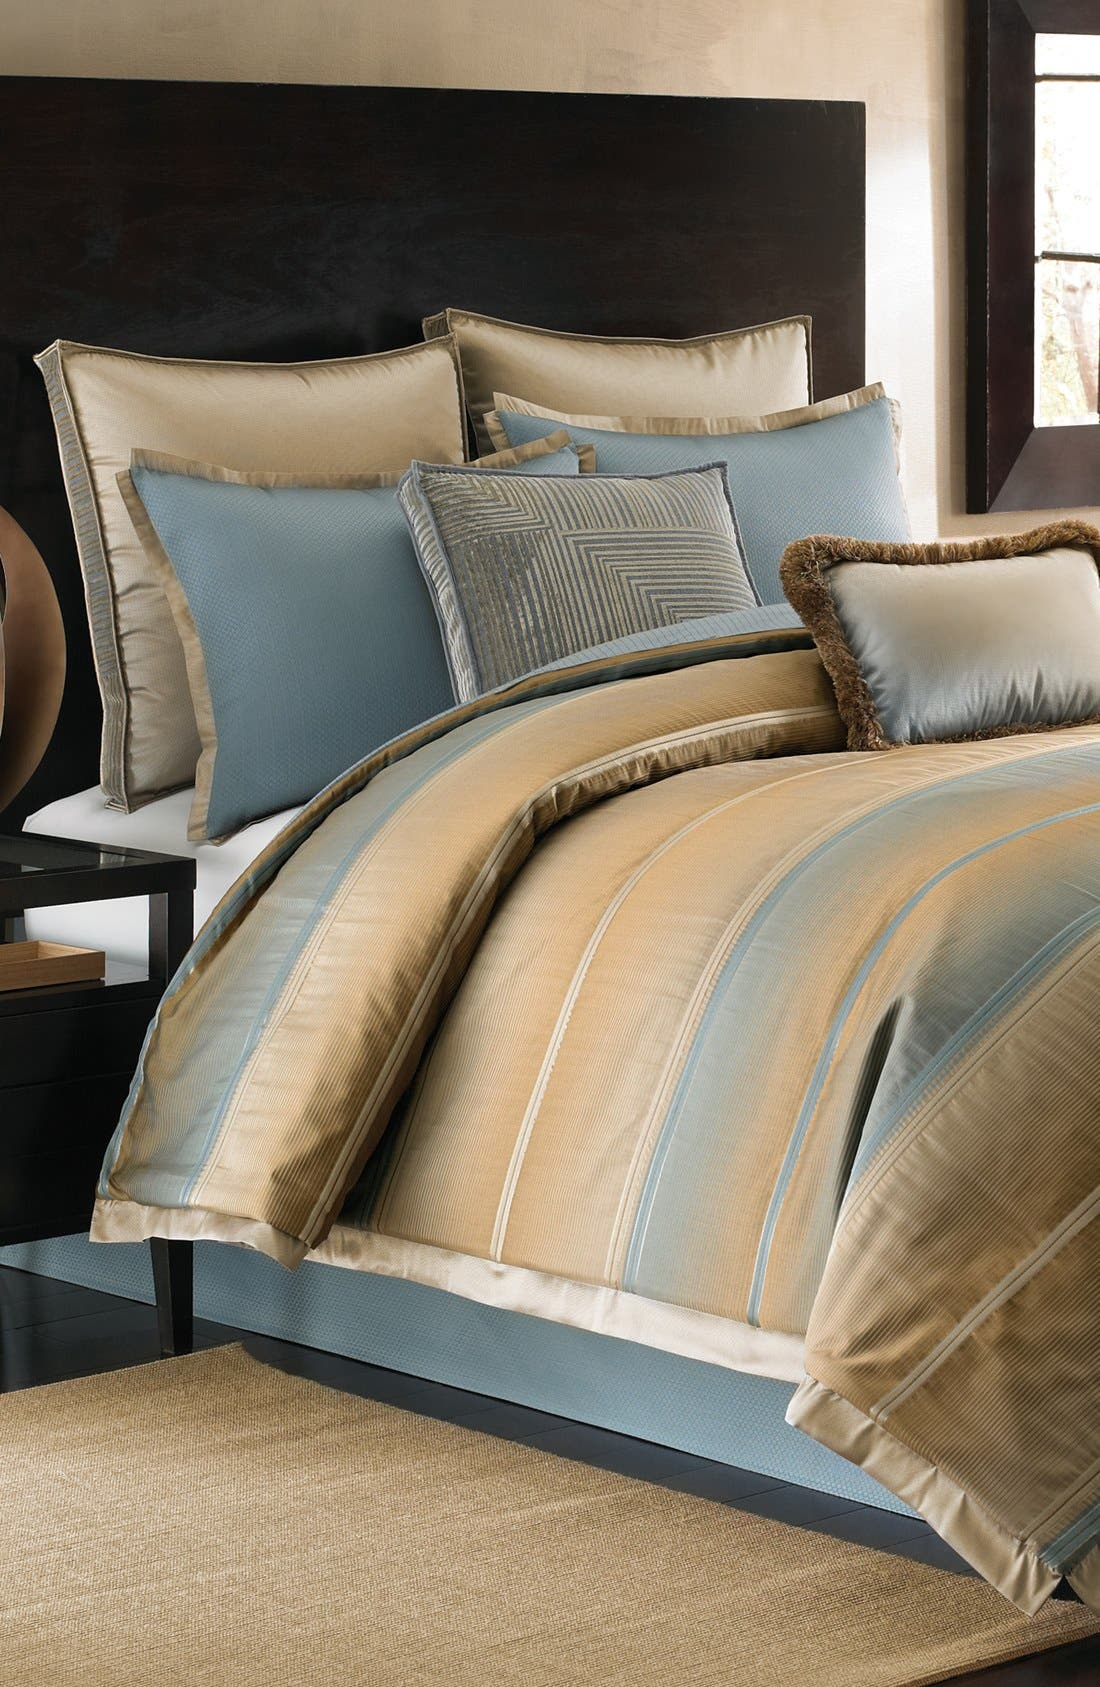 Alternate Image 1 Selected - Vince Camuto 'Munich' Comforter Set